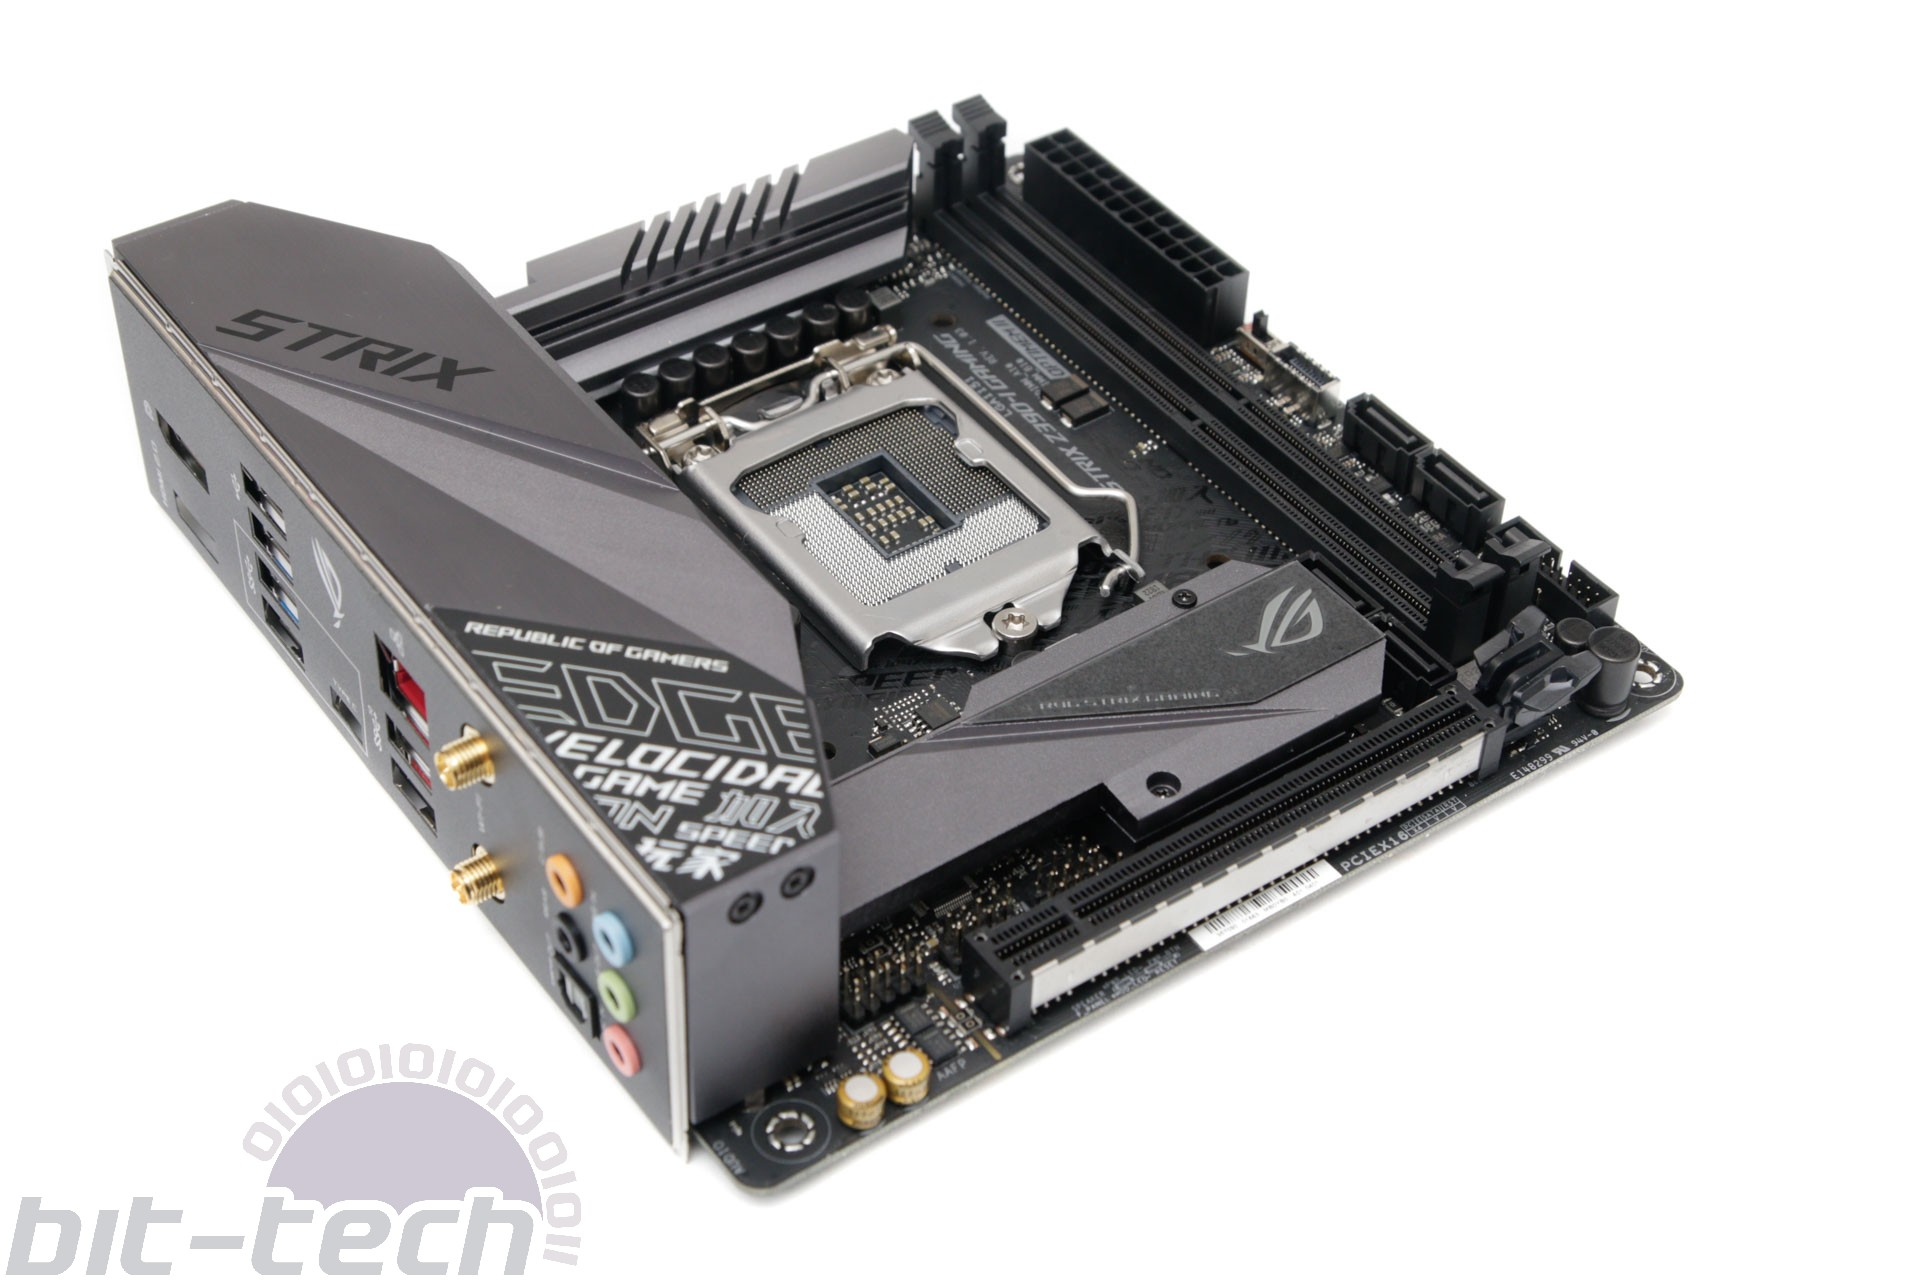 Asus ROG Strix Z390-I Gaming Review | bit-tech net